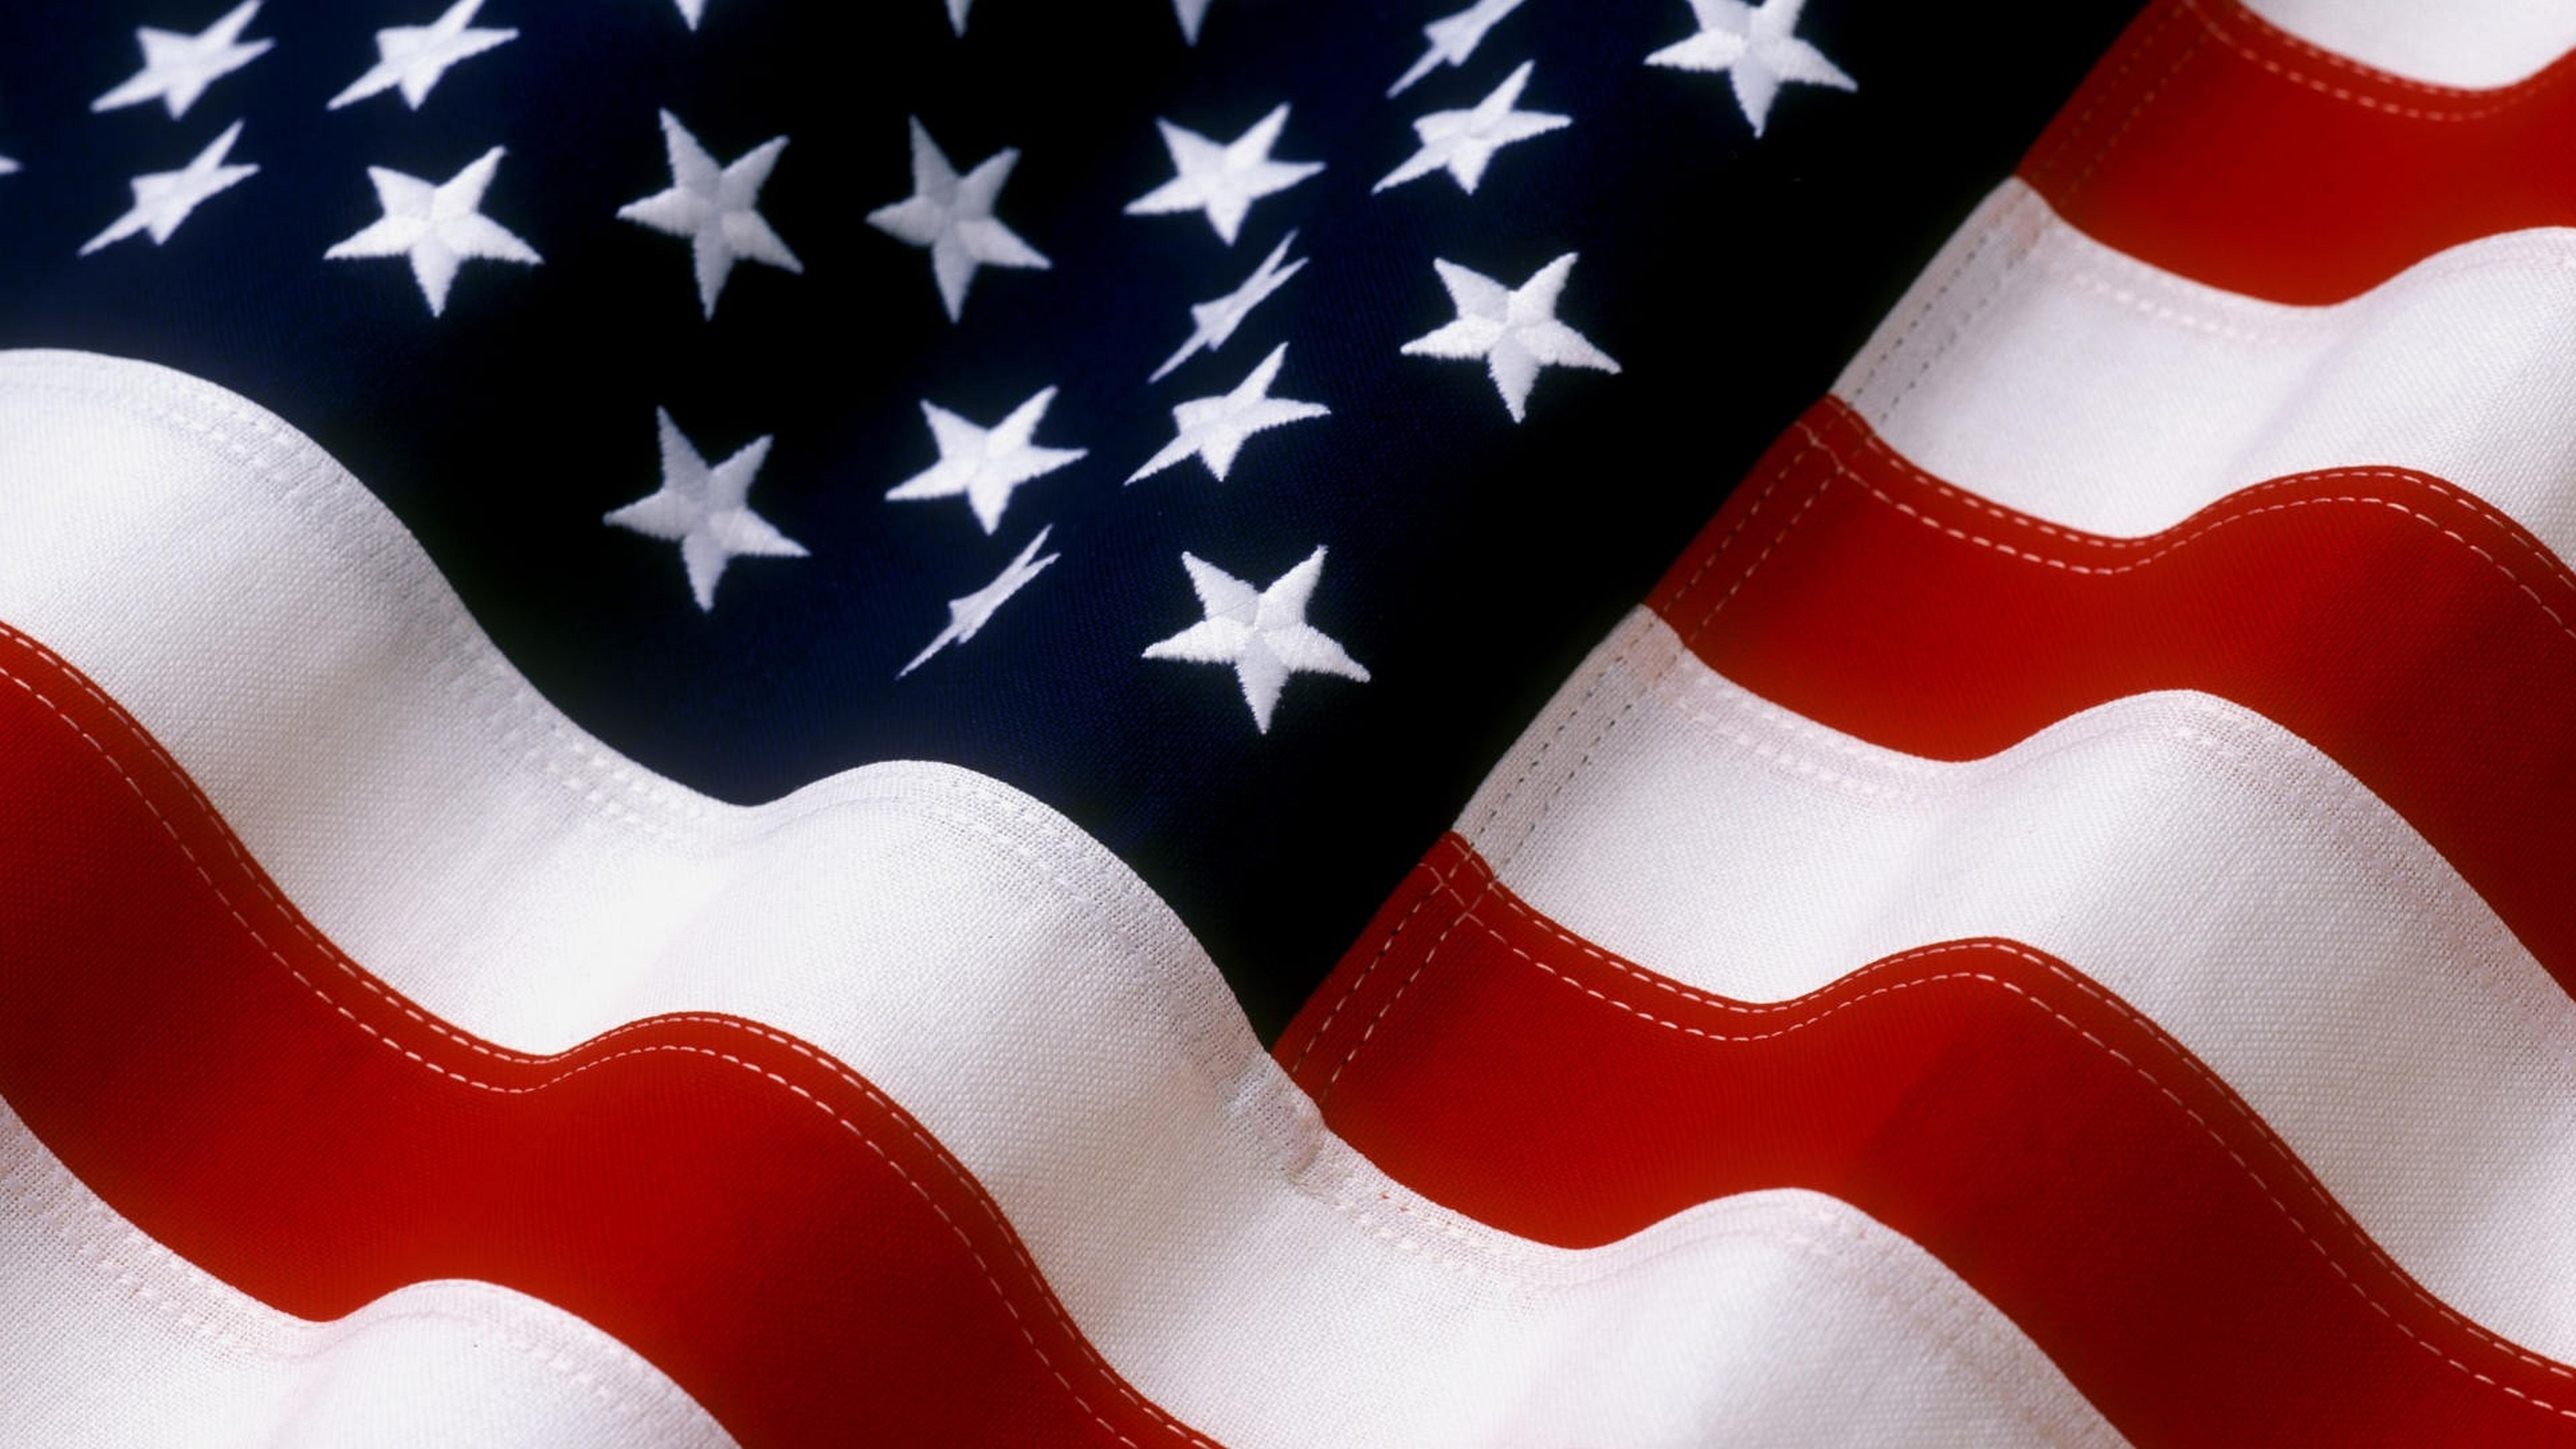 Fonds D Ecran Drapeau Americain Texture 3840x2160 Uhd 4k Image